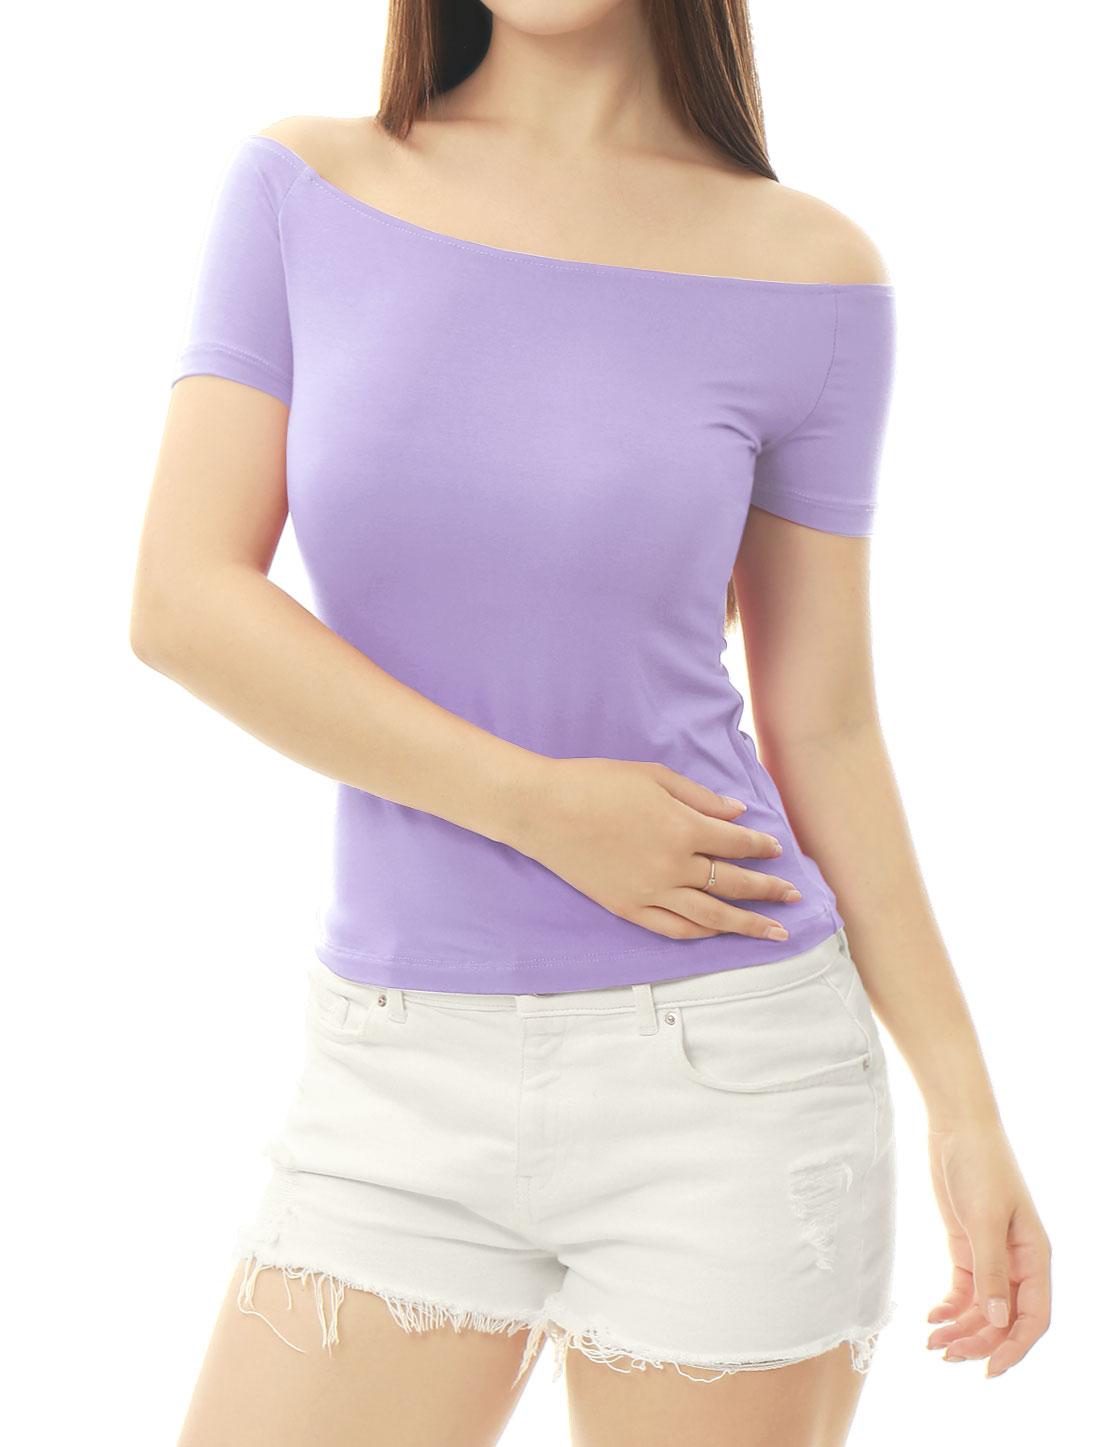 Women Short Sleeves Slim Fit Off the Shoulder Top Lavender XS